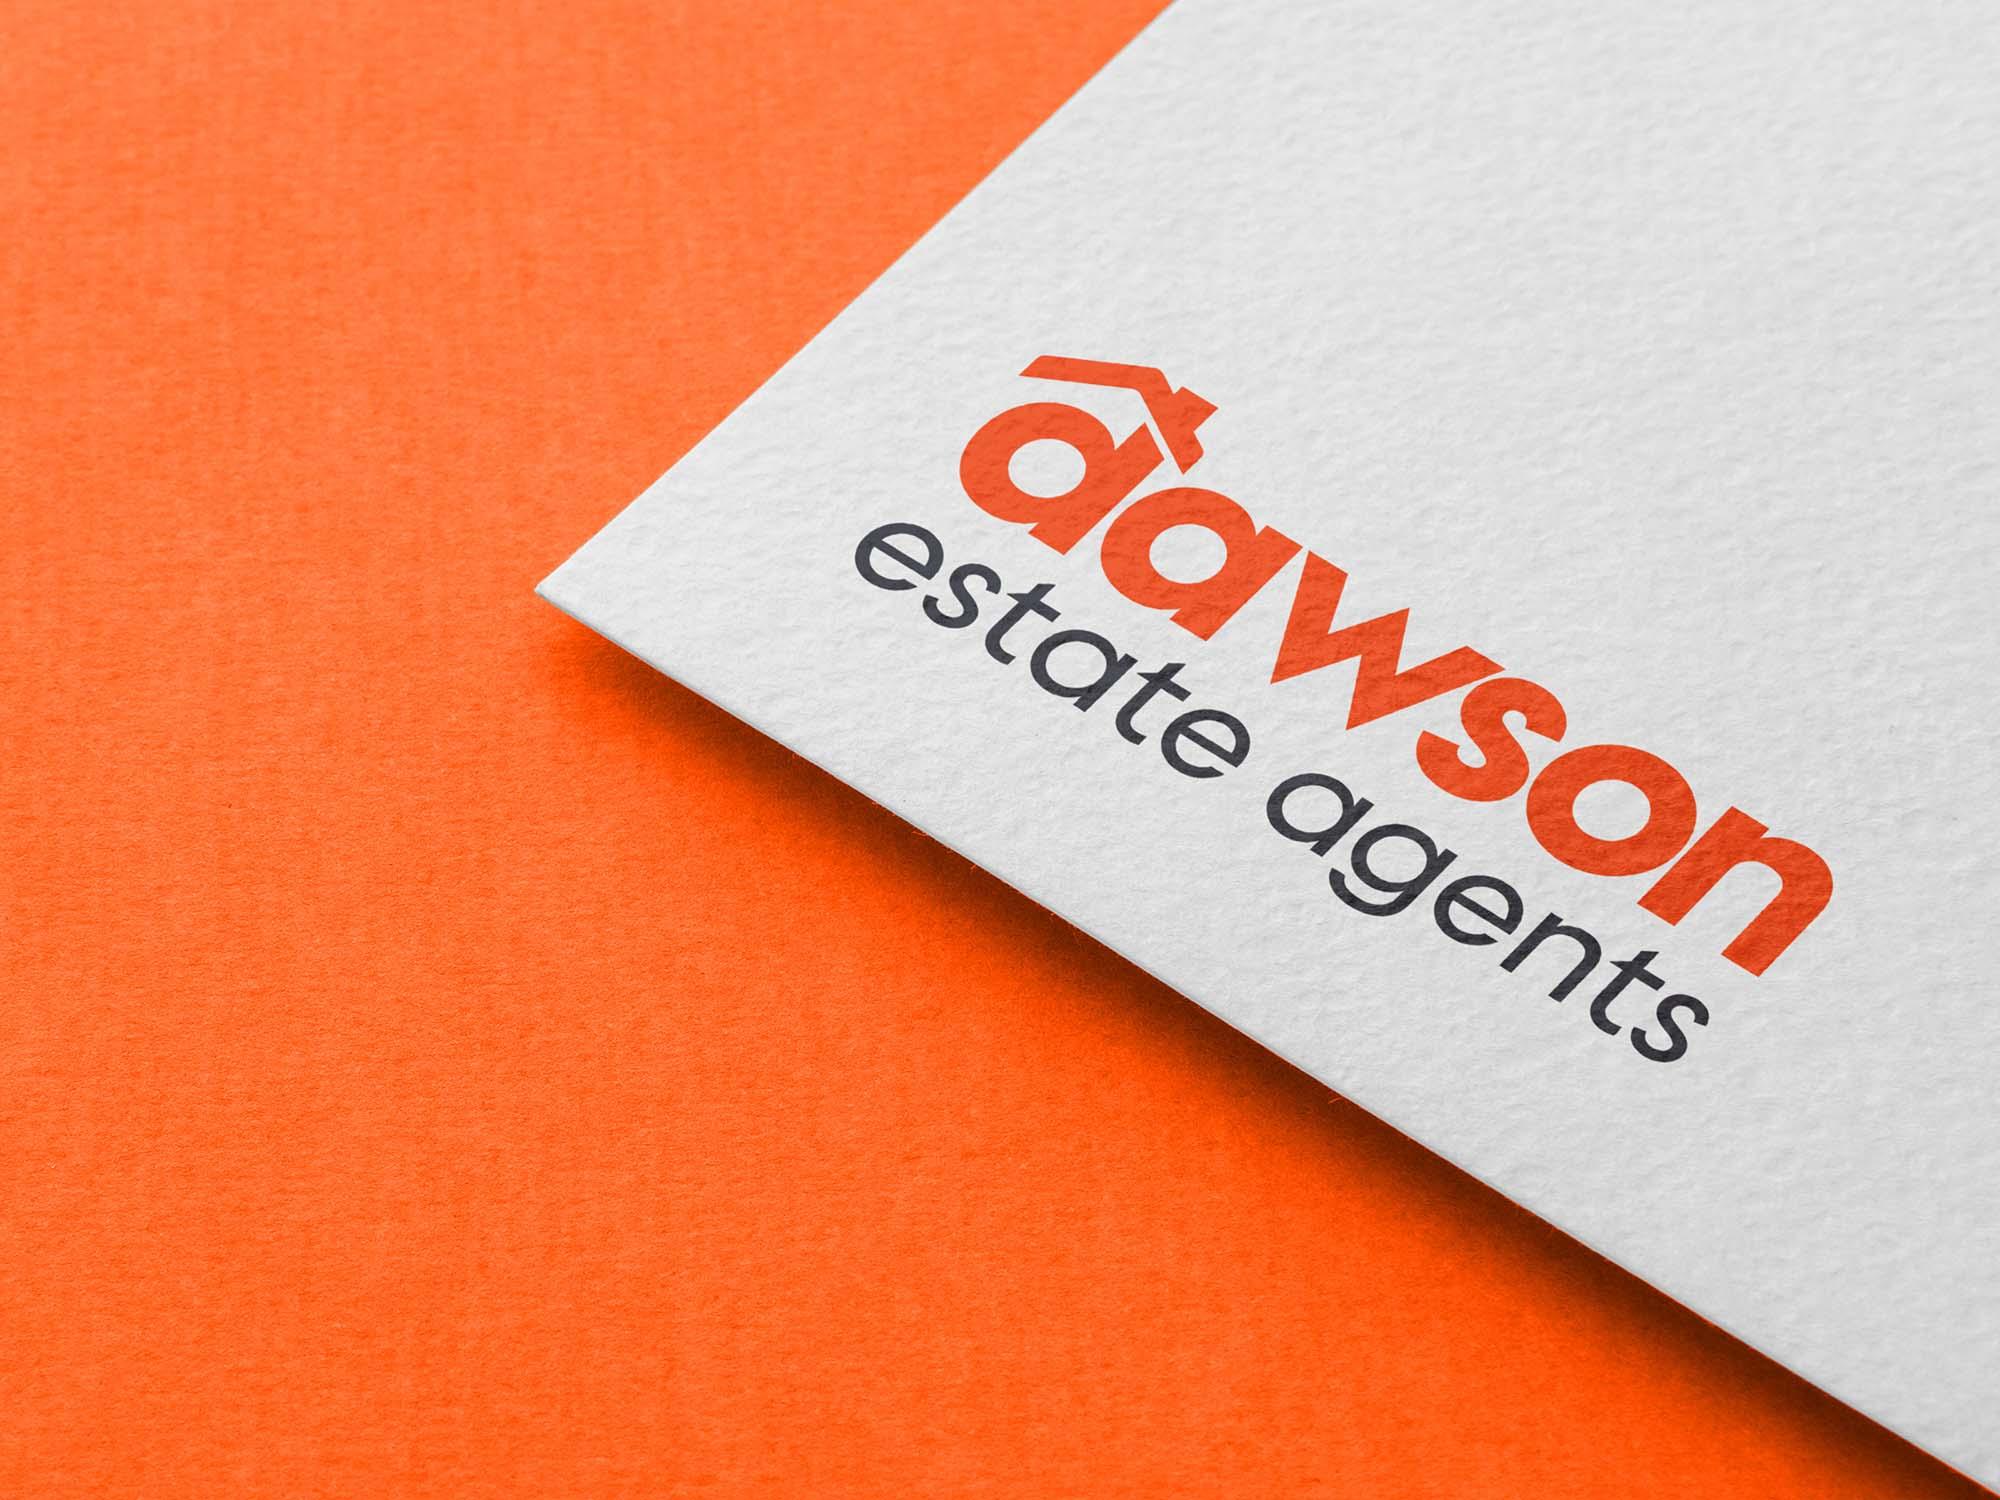 Dawson Estate Agents logo on parchment